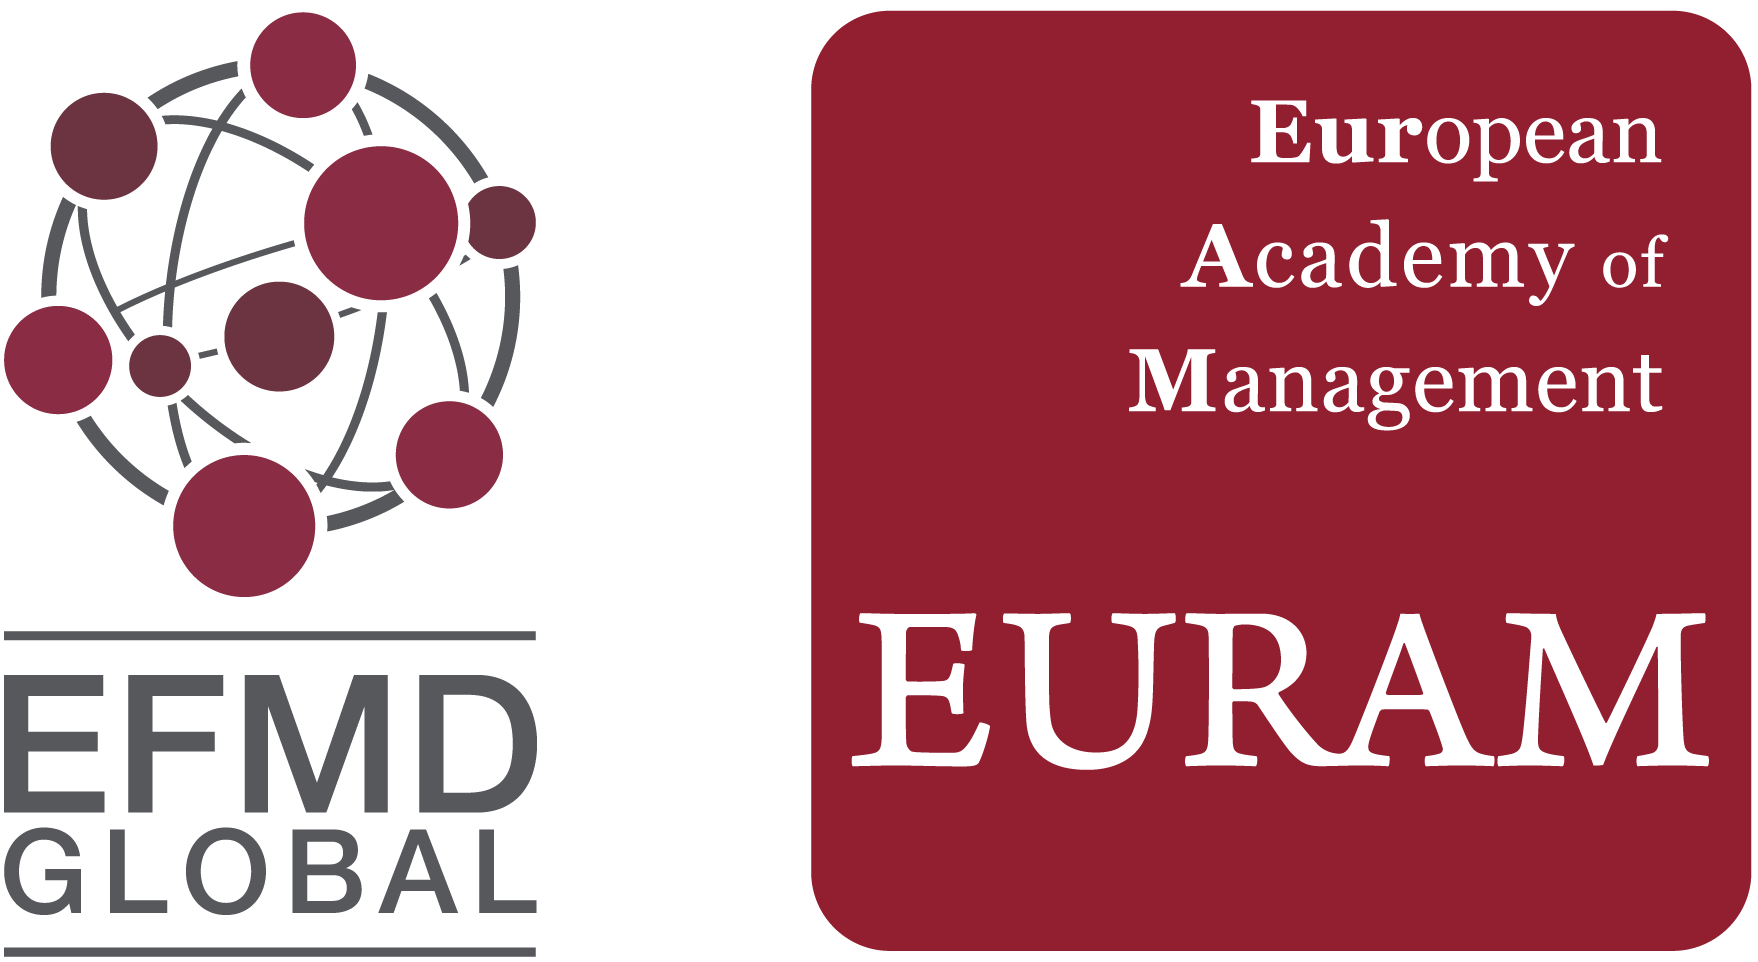 EFMD-Global-EURAM-cut